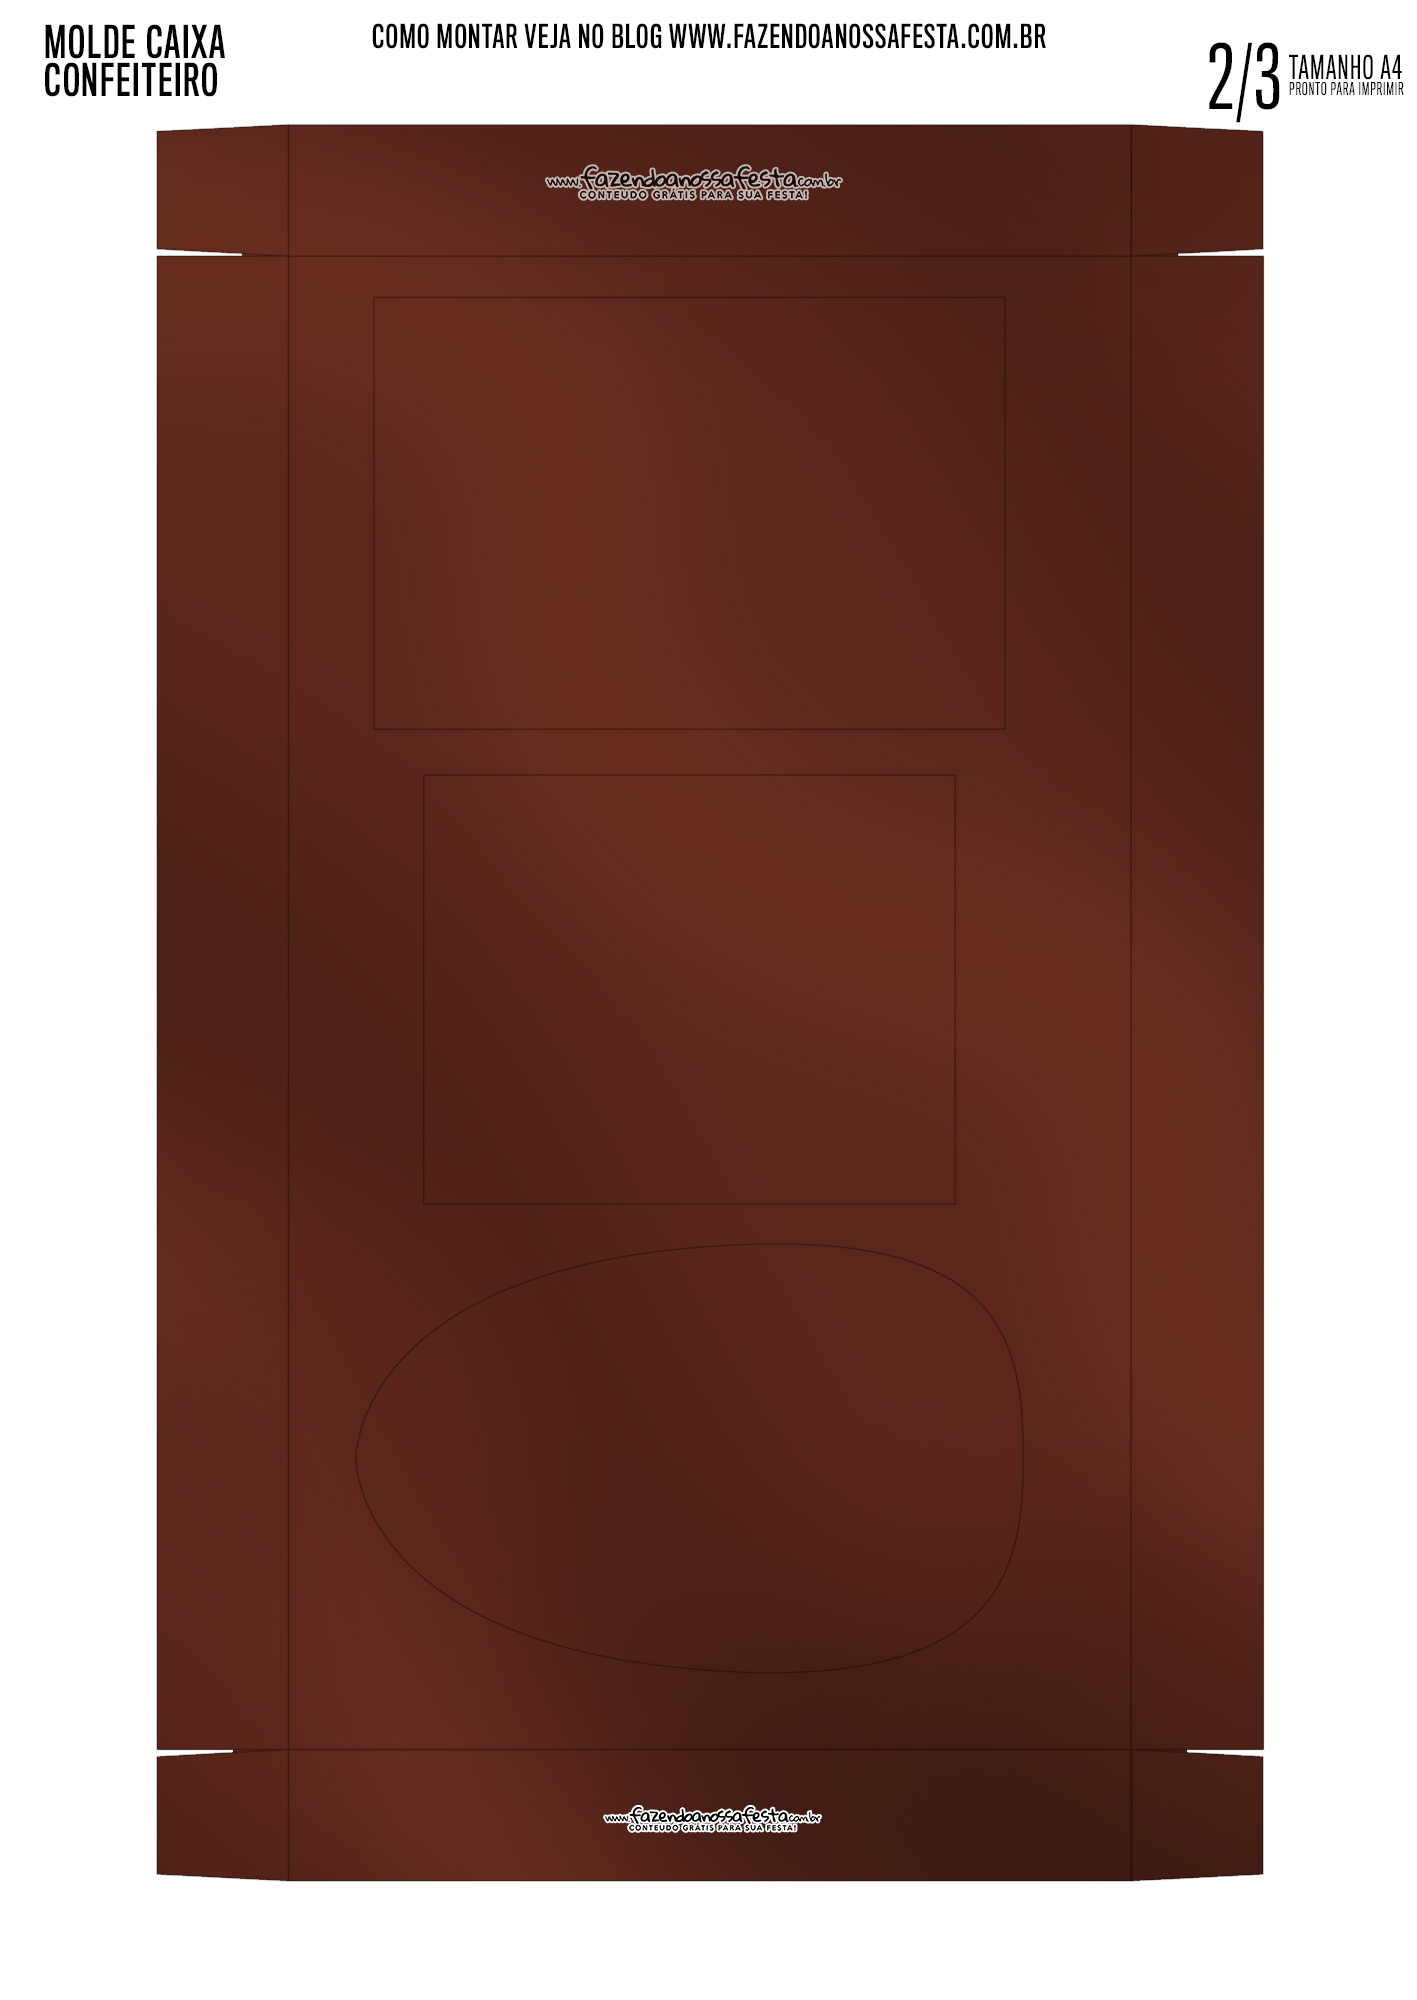 Caixa Kit Mini Confeiteiro Chocolates Nutella parte de dentro